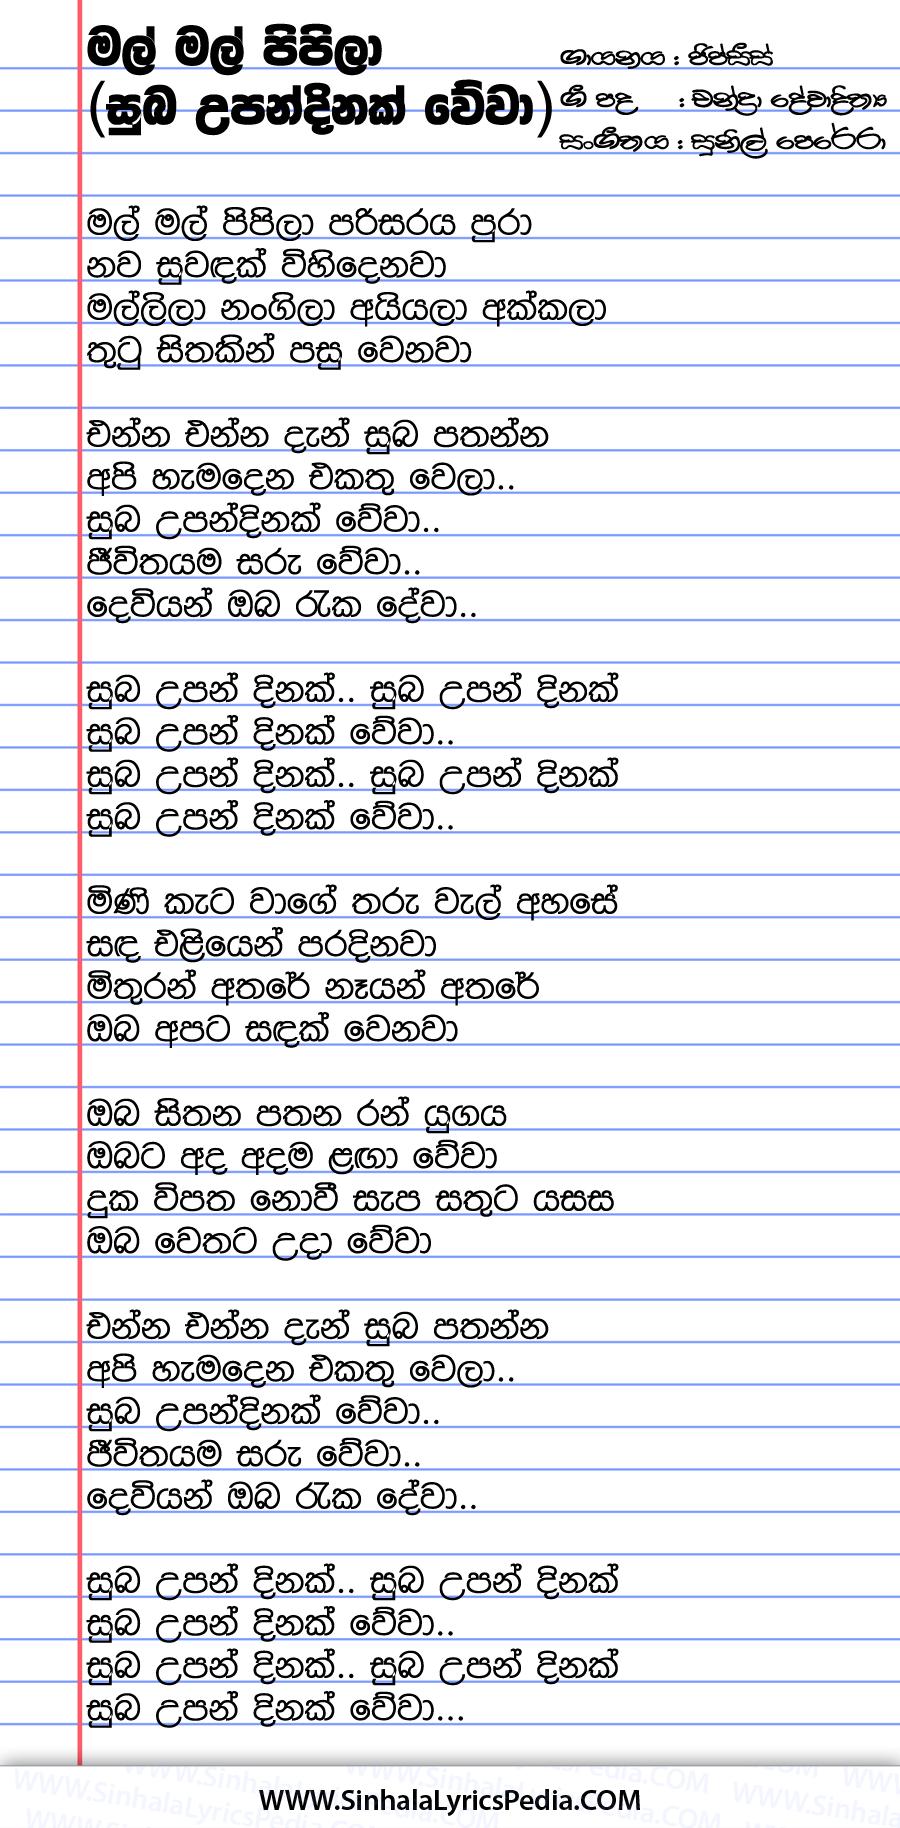 Mal Mal Pipila (Suba Upandinak Wewa) Song Lyrics